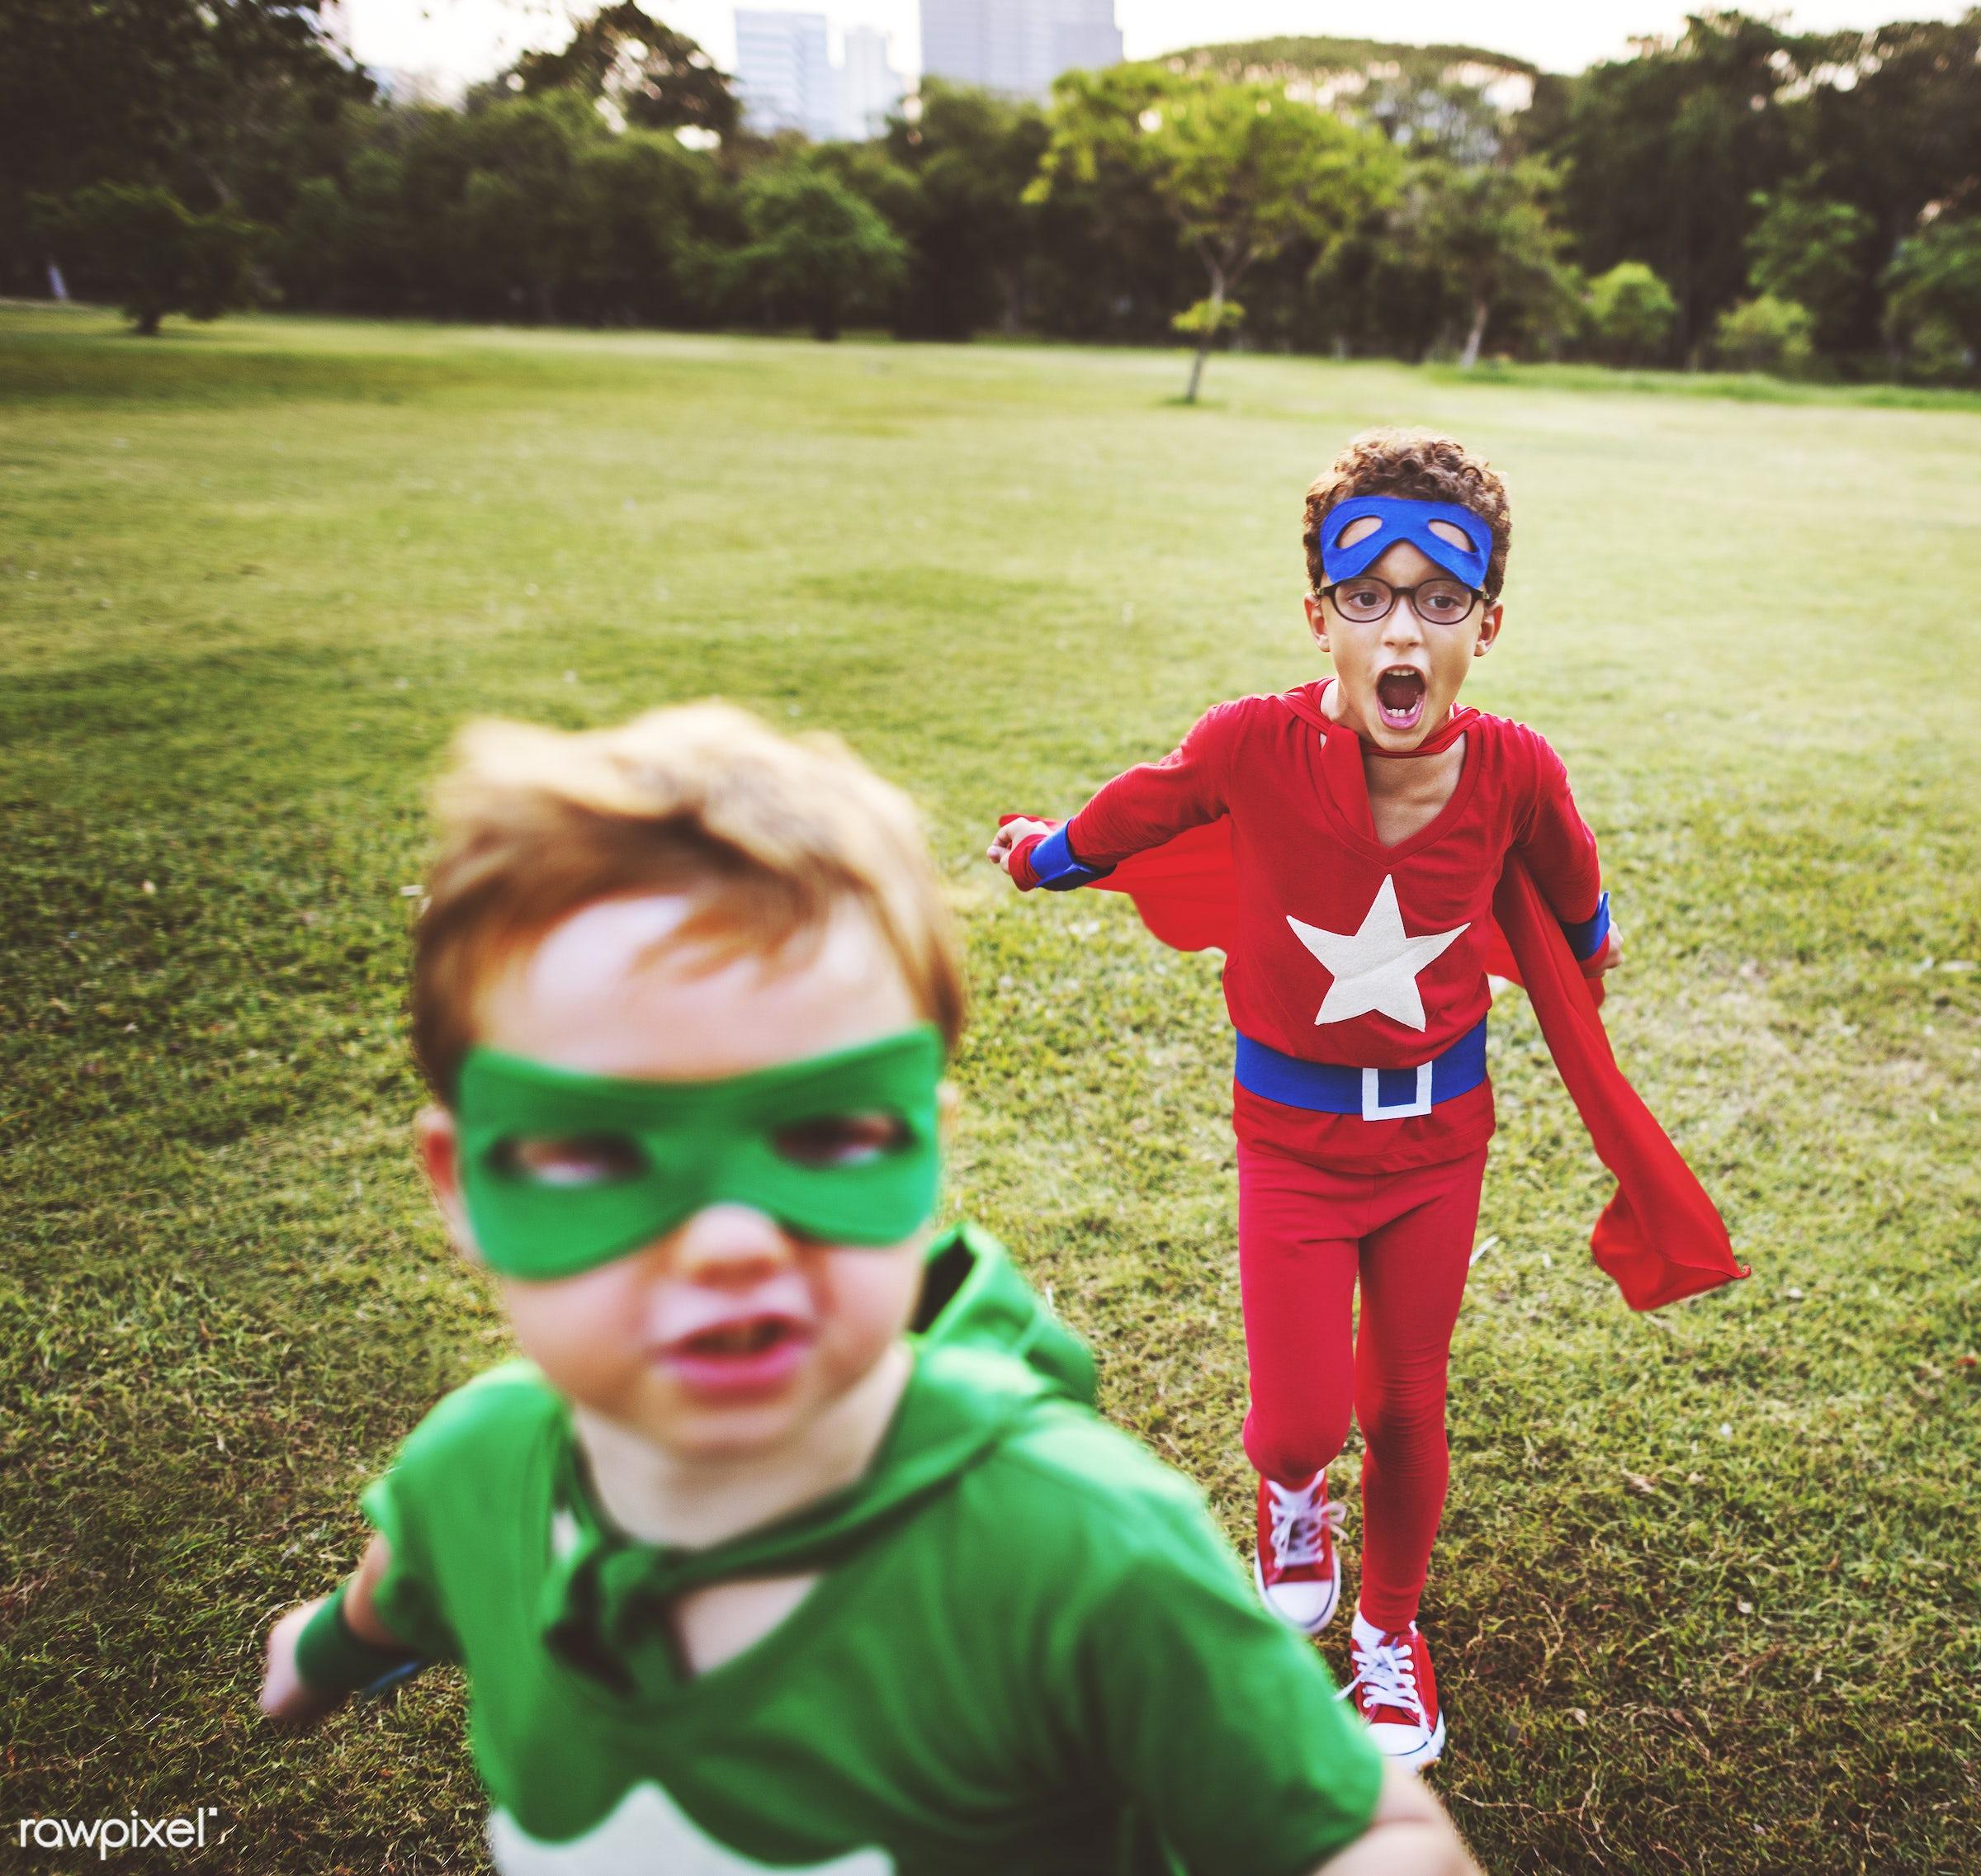 superhero, adorable, african descent, asian ethnicity, aspiration, boys, cape, cheerful, child, childhood, children,...